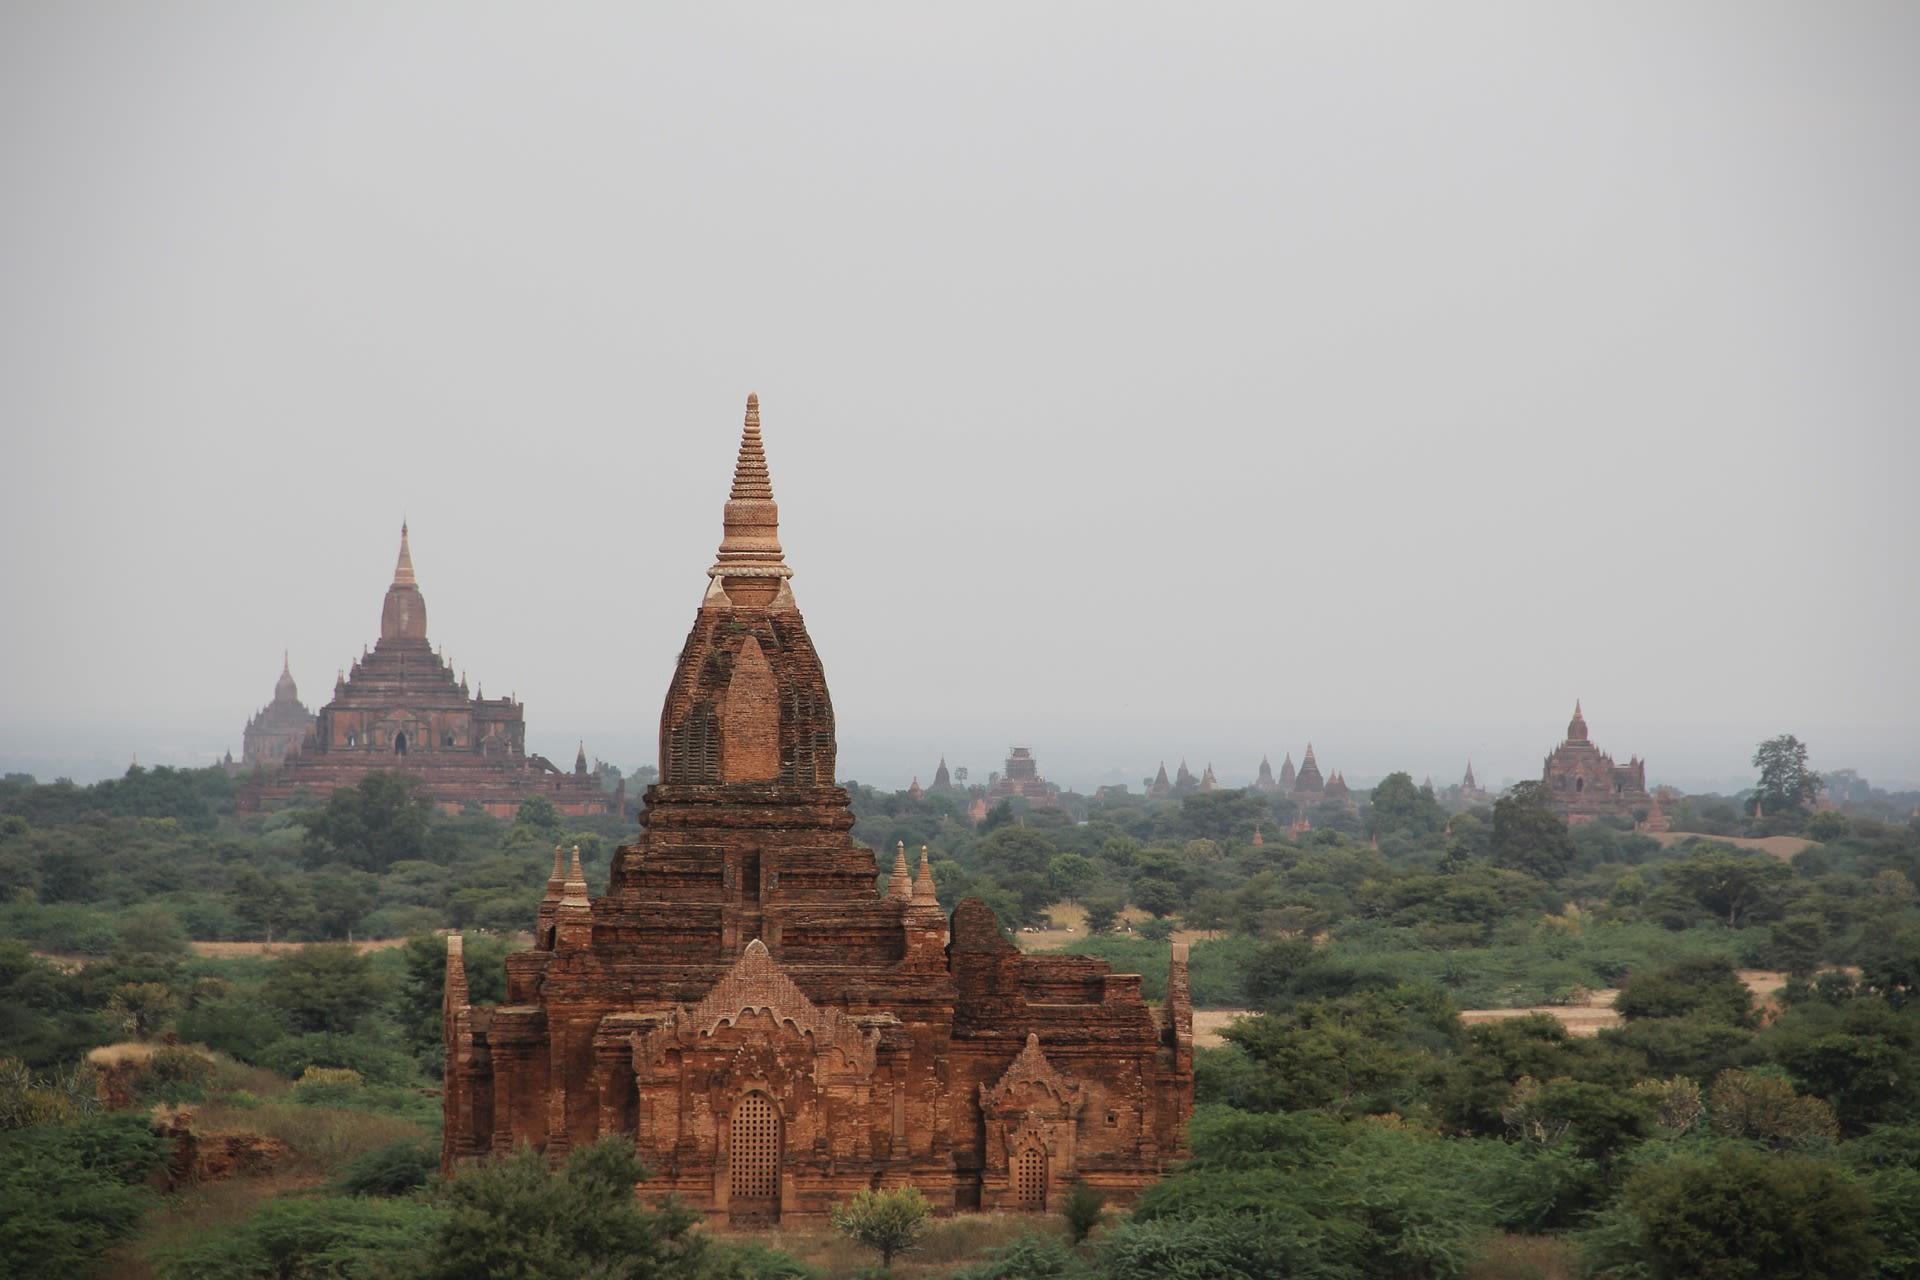 Local Pagodas